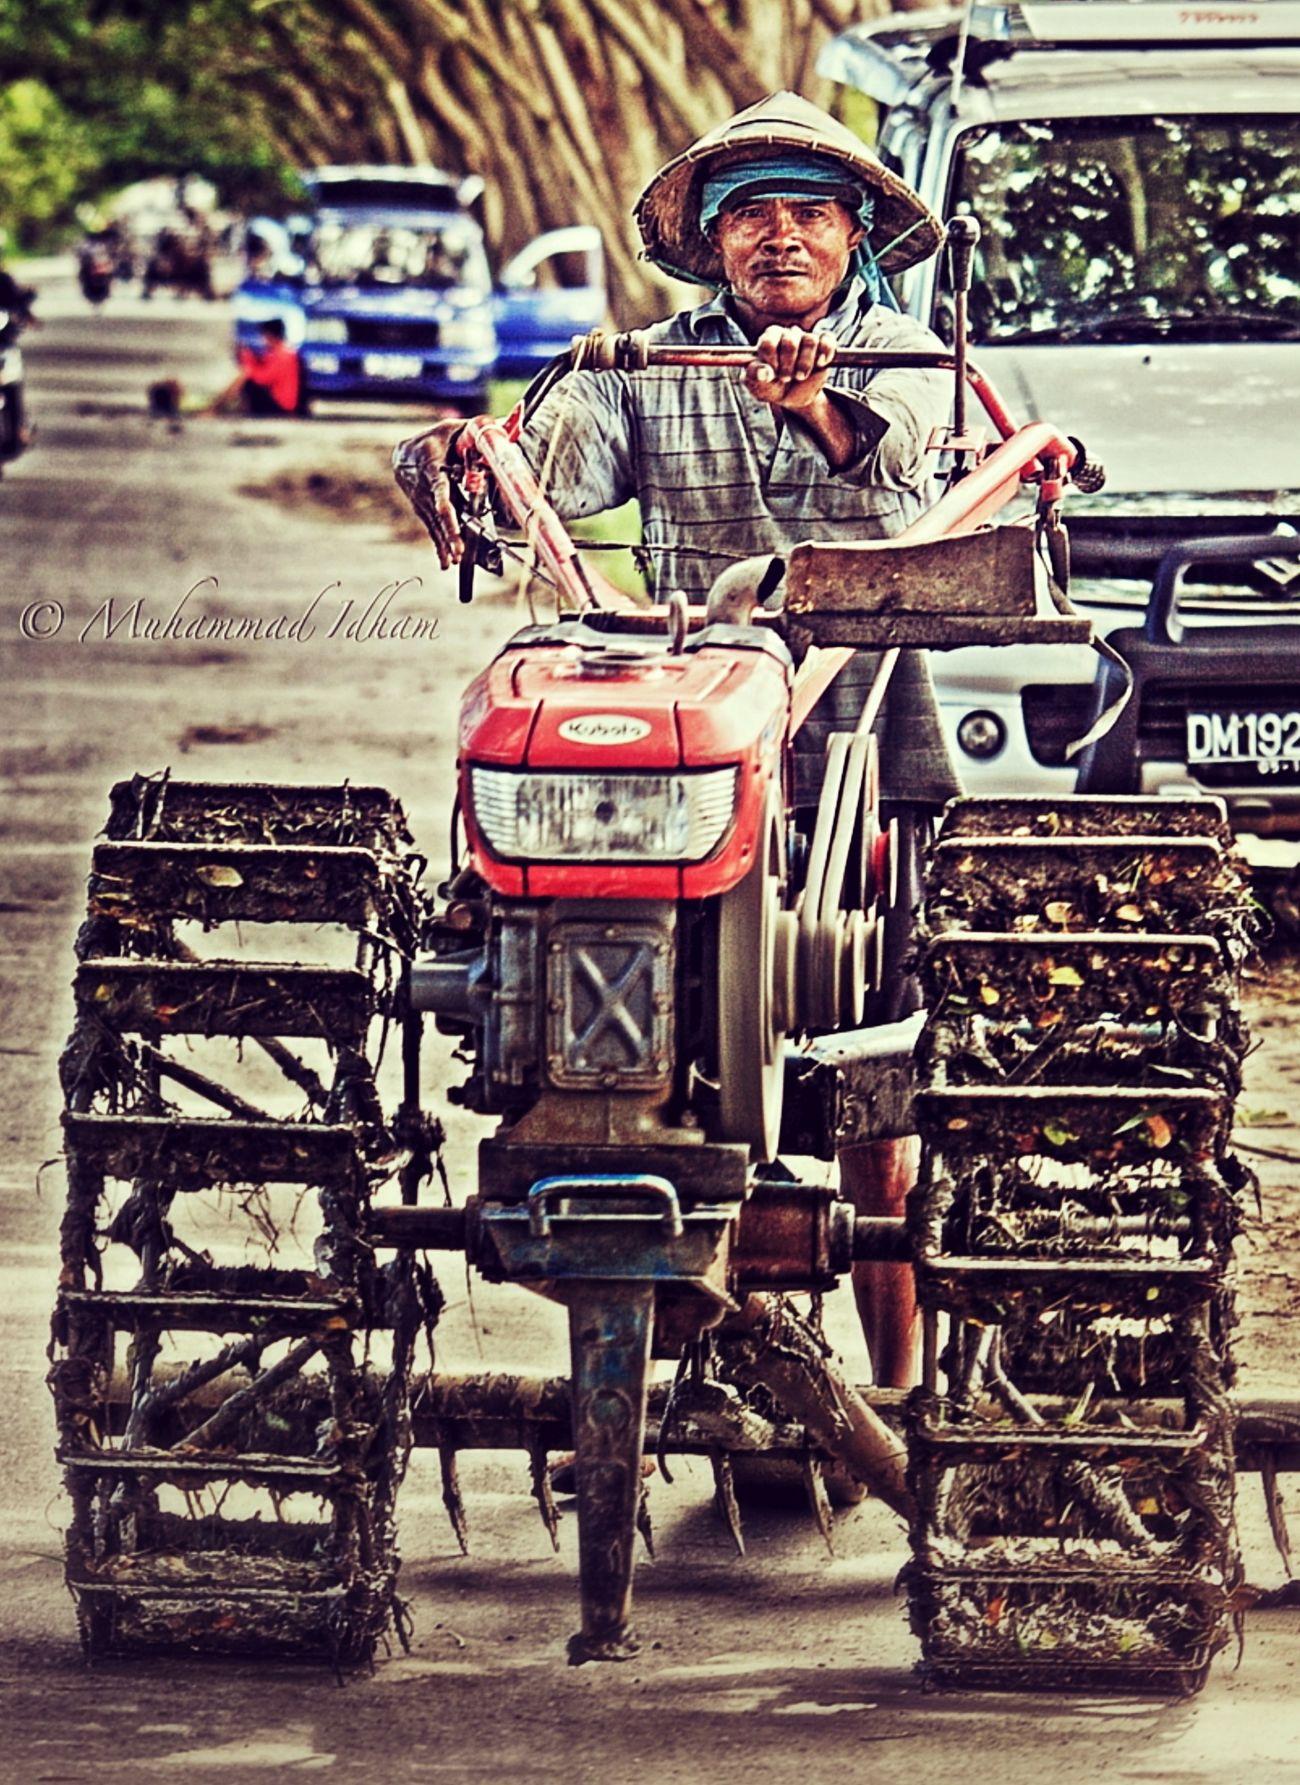 Streetphotography EyeEm Indonesia Indonesia Banget EyeEm Best Shots